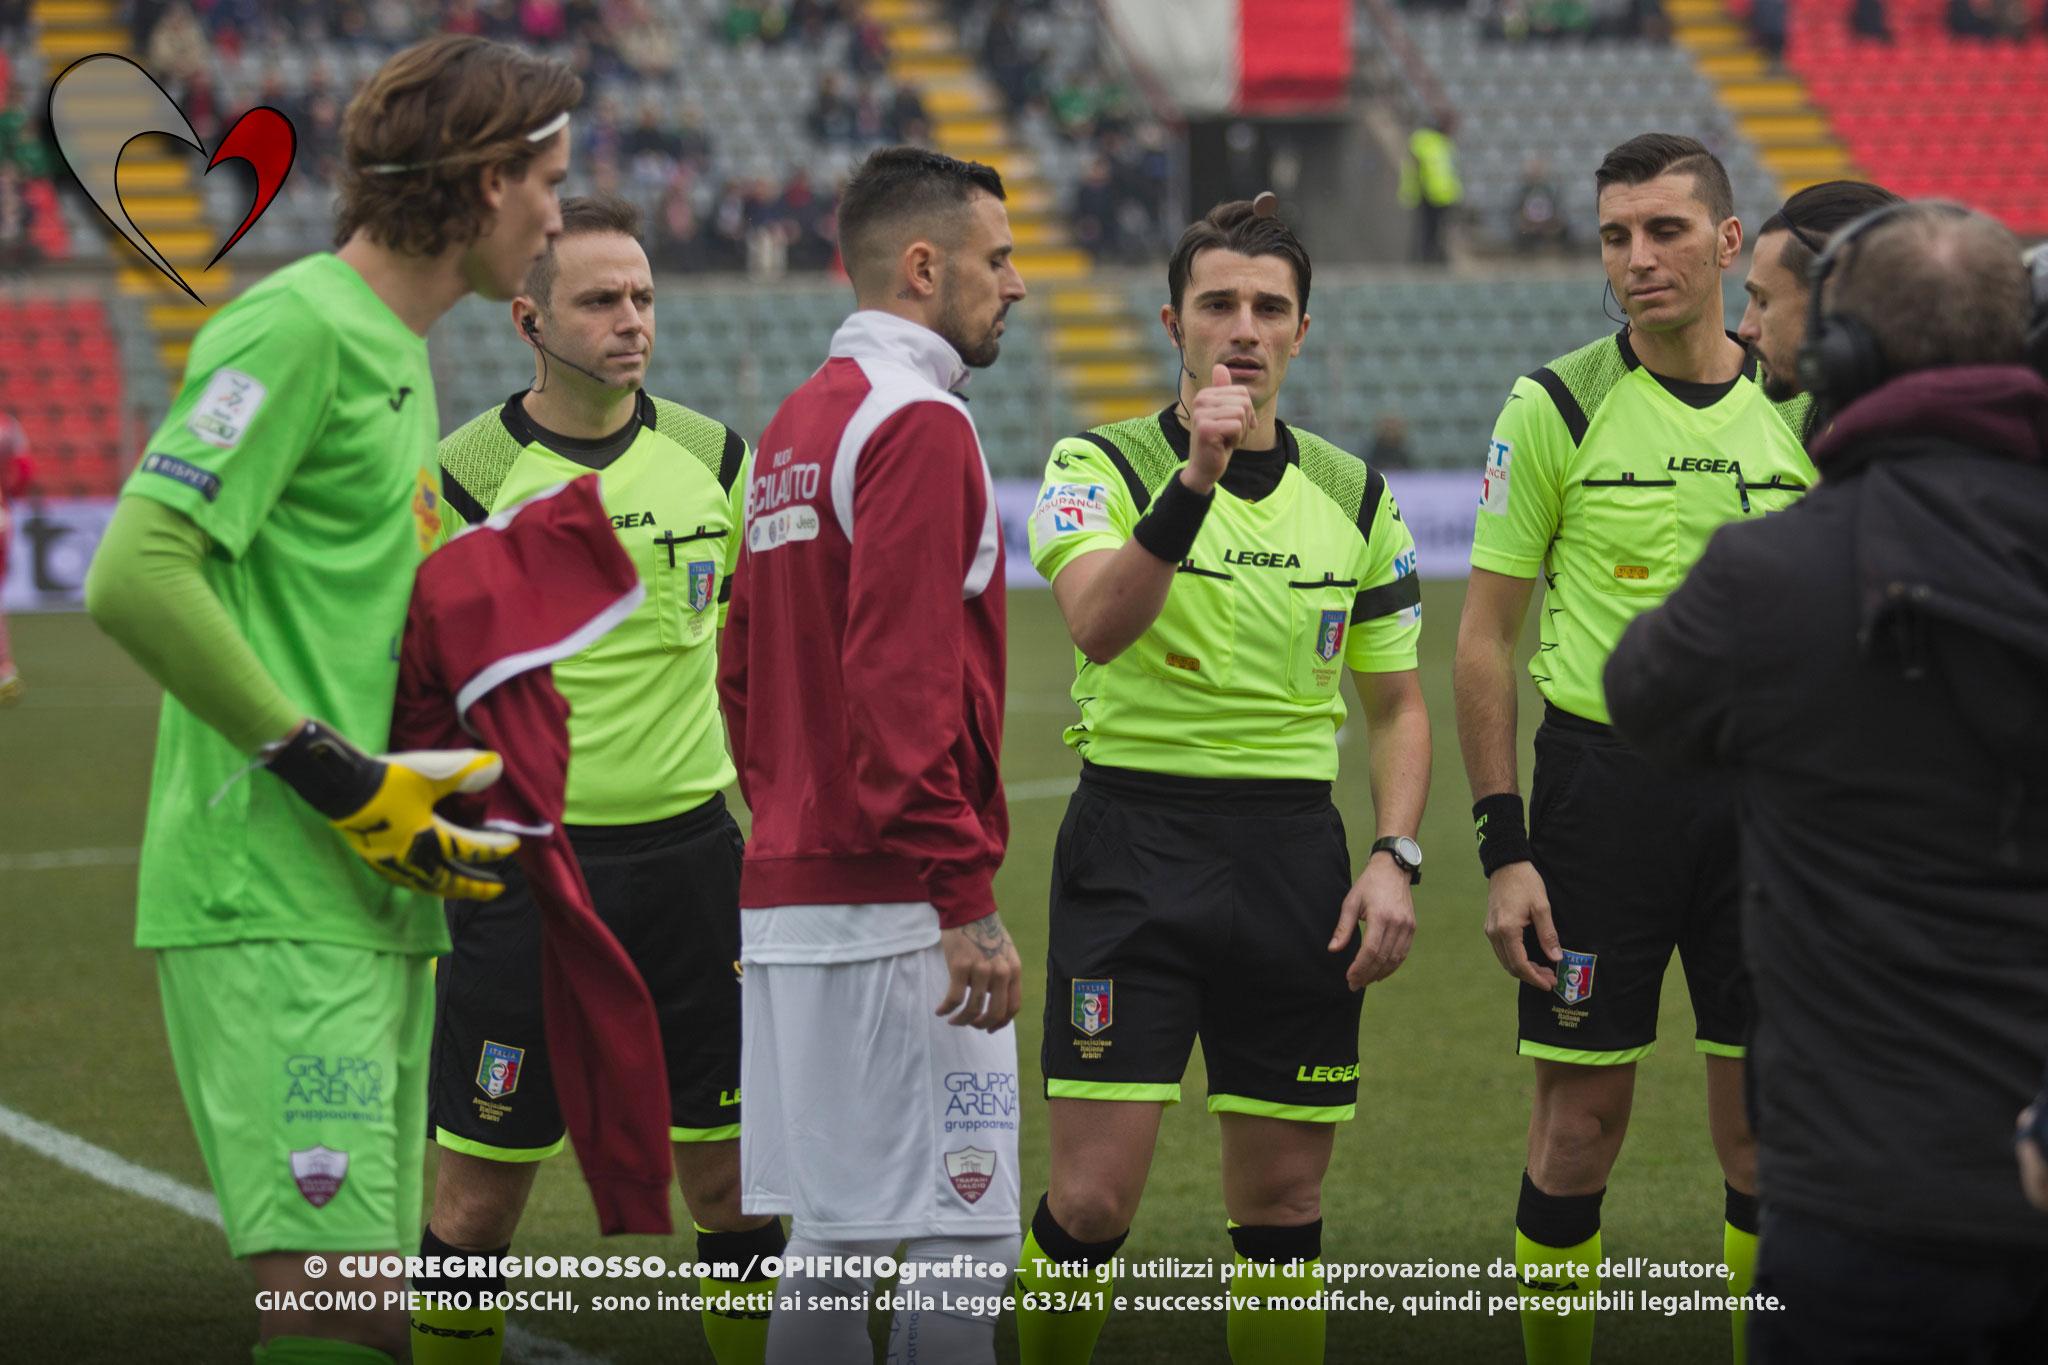 UFFICIALE: ricorso respinto, Trapani in C. Pescara ai playout